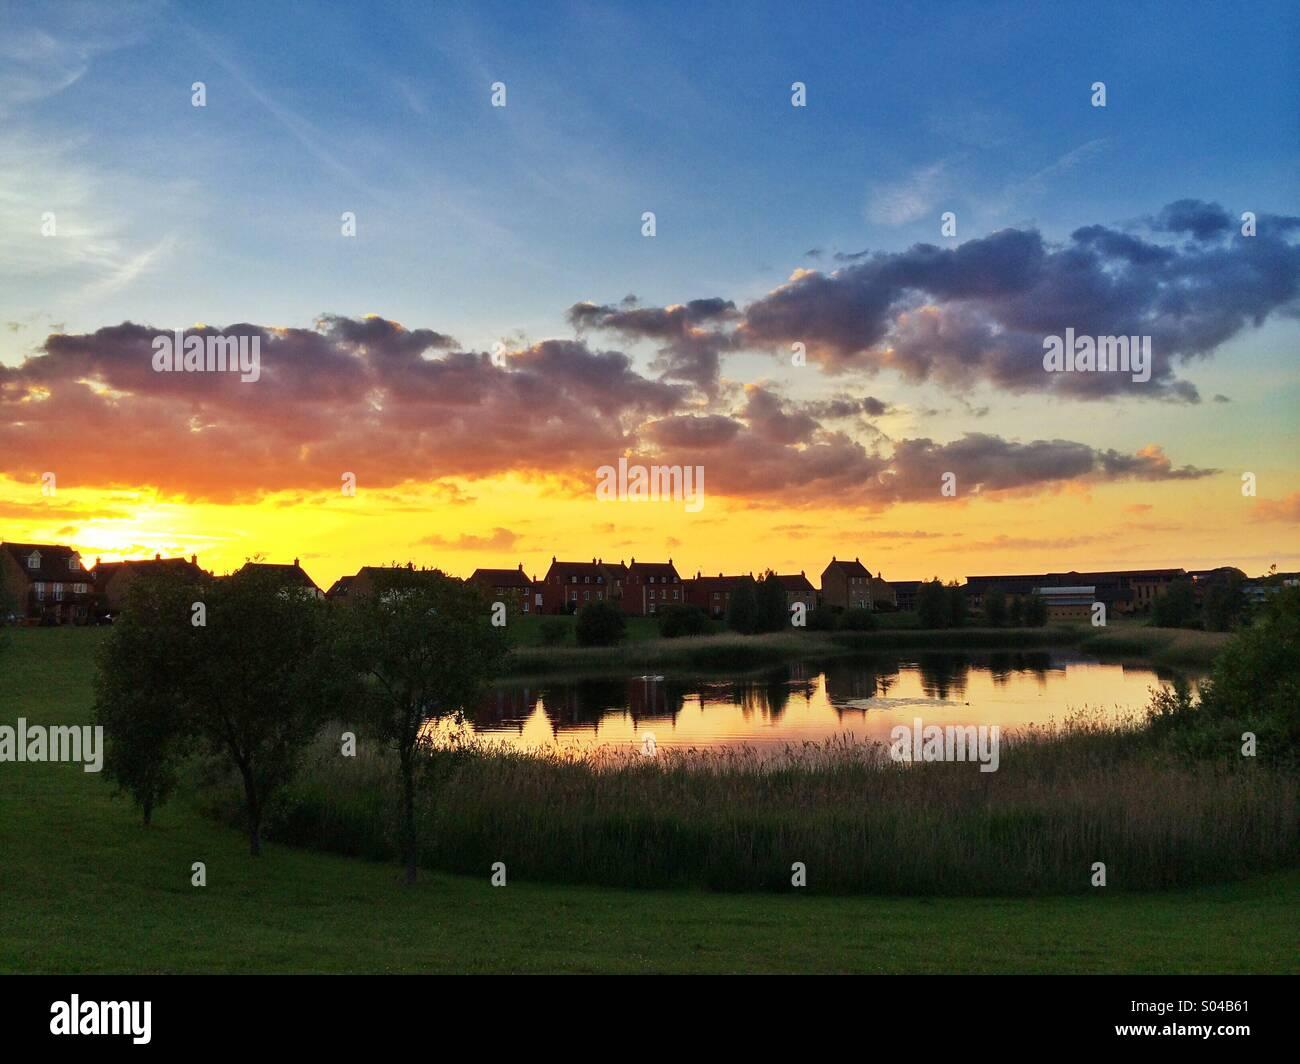 Houses overlooking lake at sunset, Hampton Vale, Peterborough, UK - Stock Image